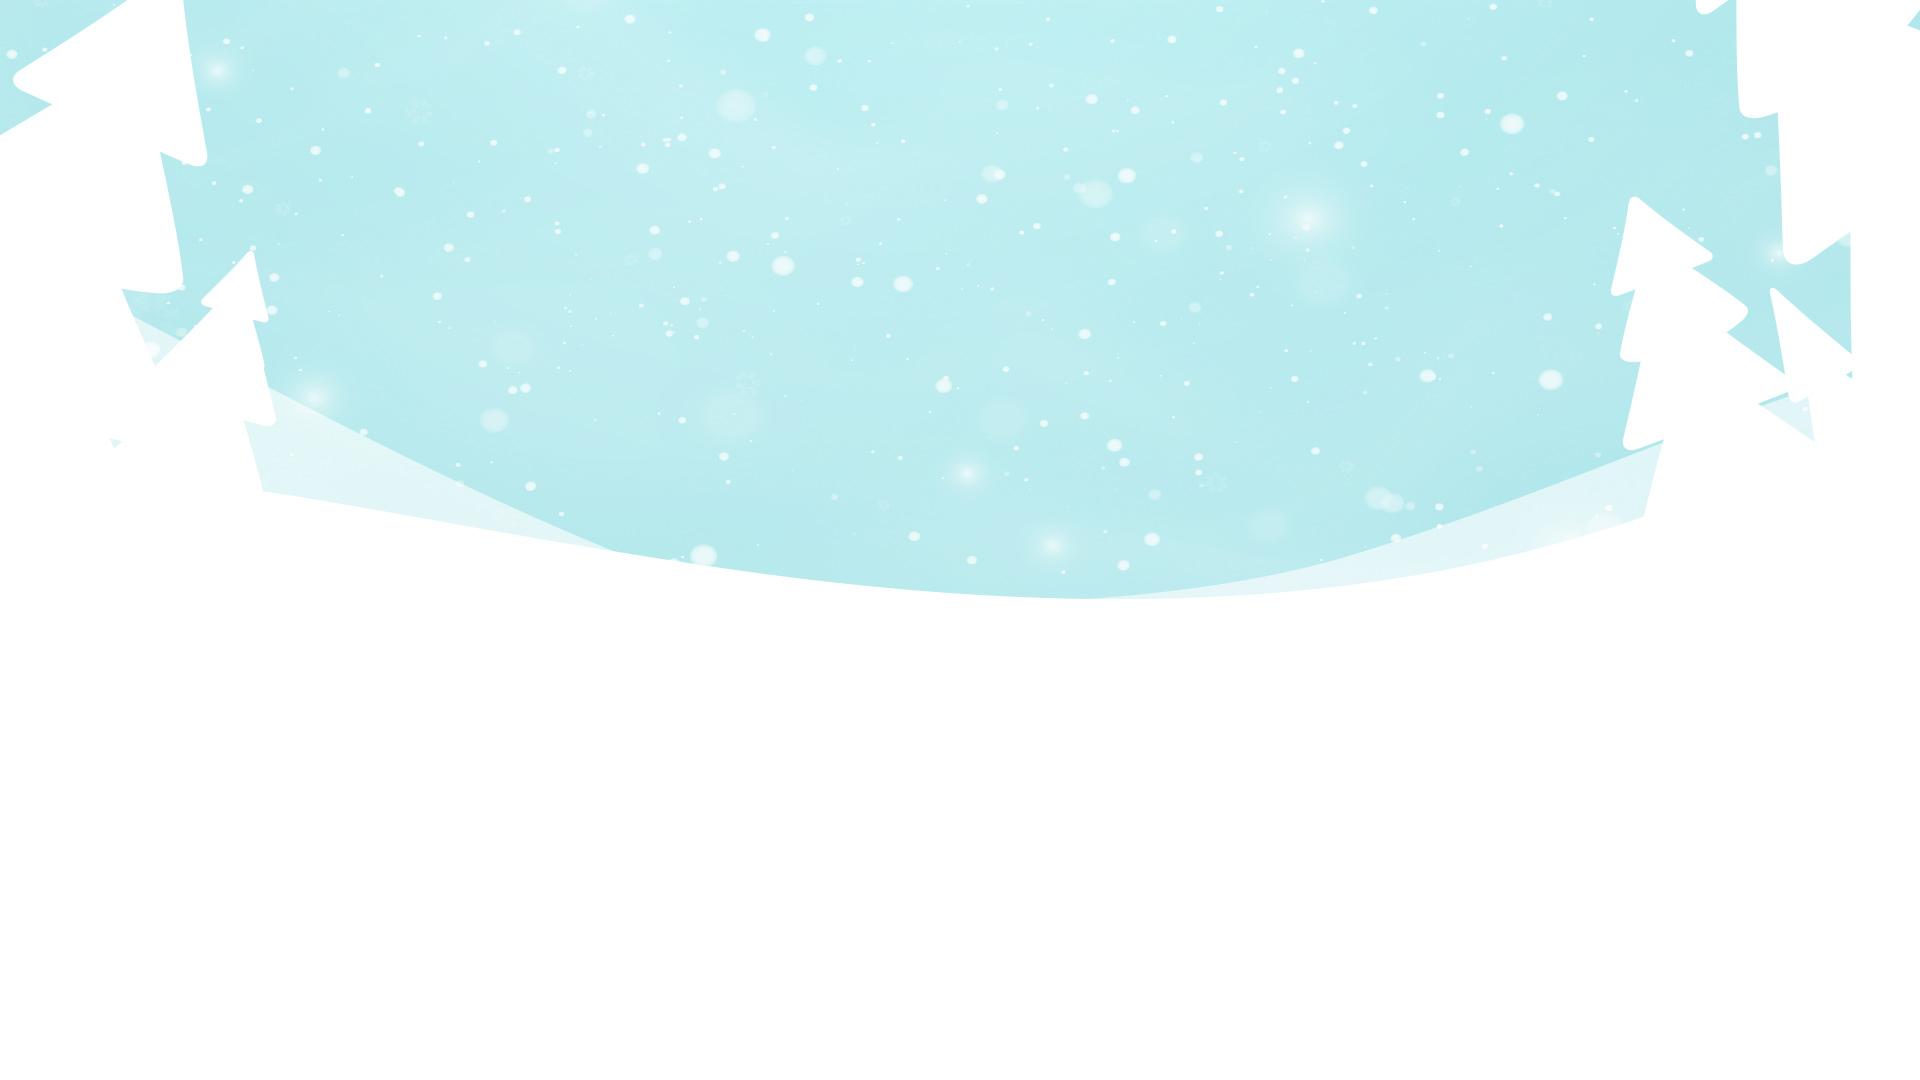 superbook kids site india free online games bible based